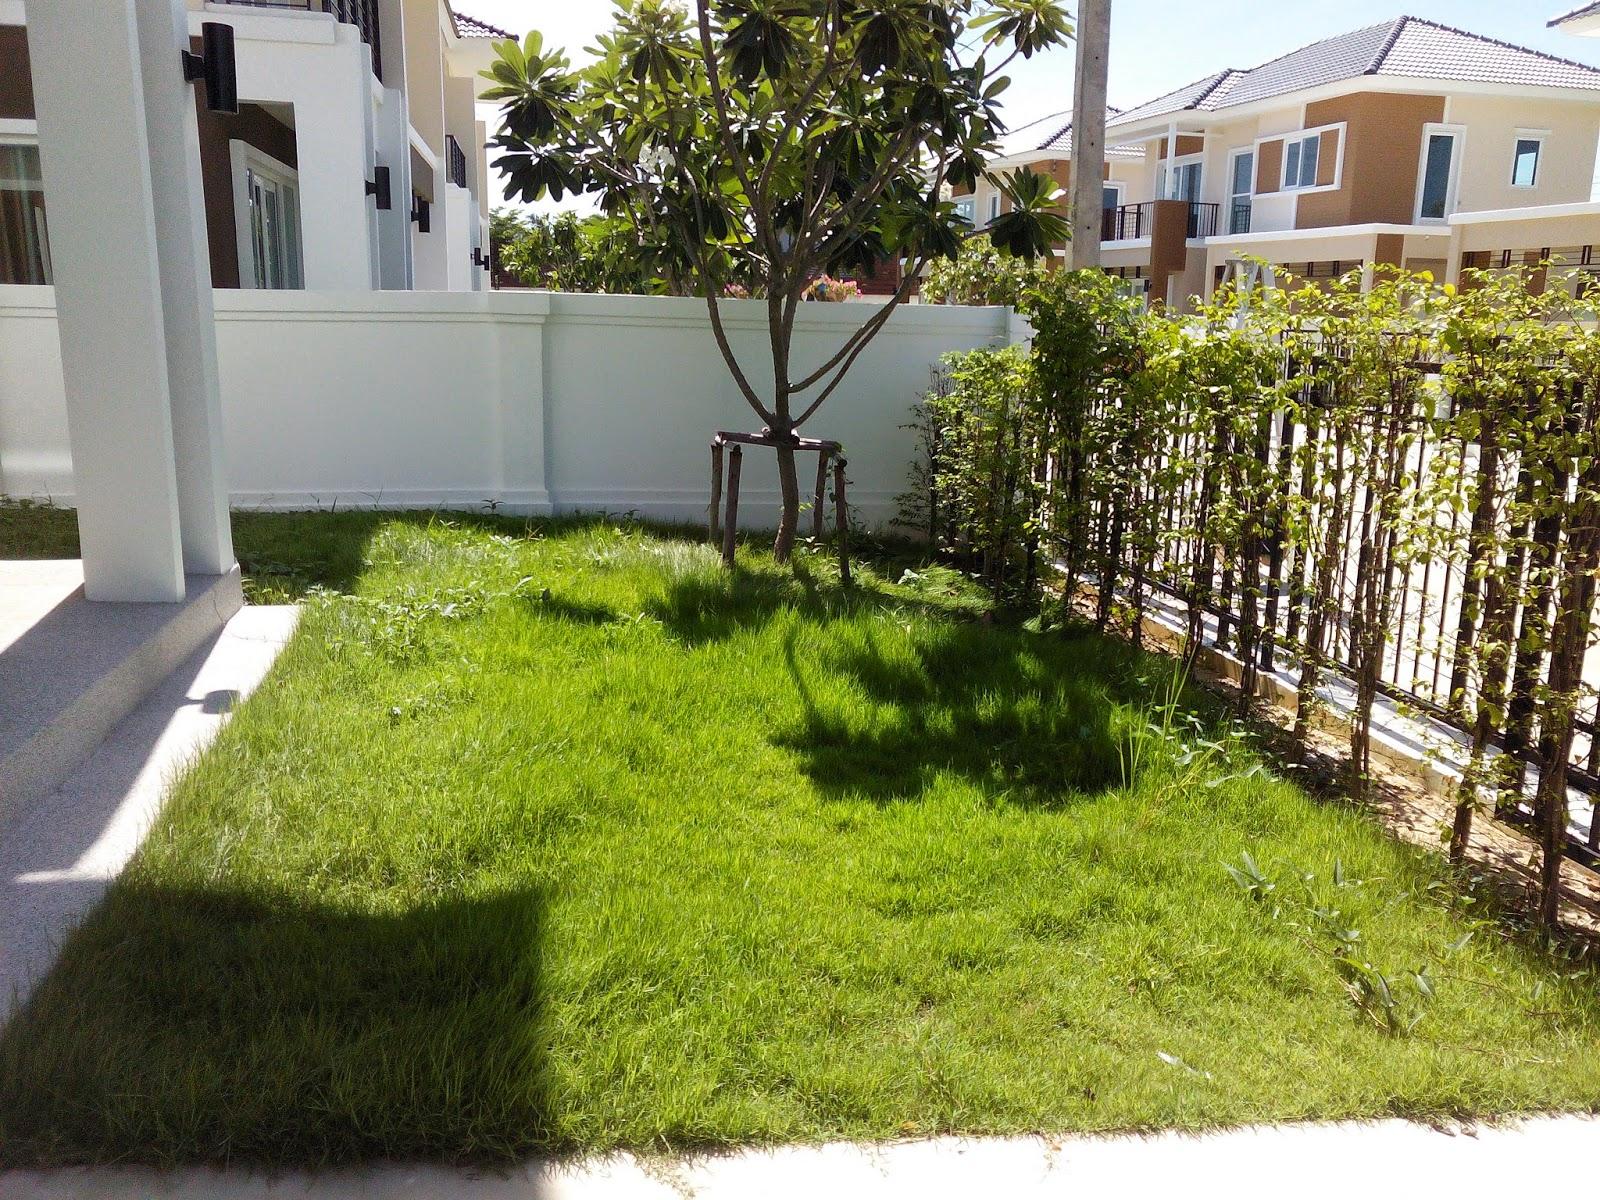 http://gardenone.blogspot.com/2012/12/blog-post_9.html